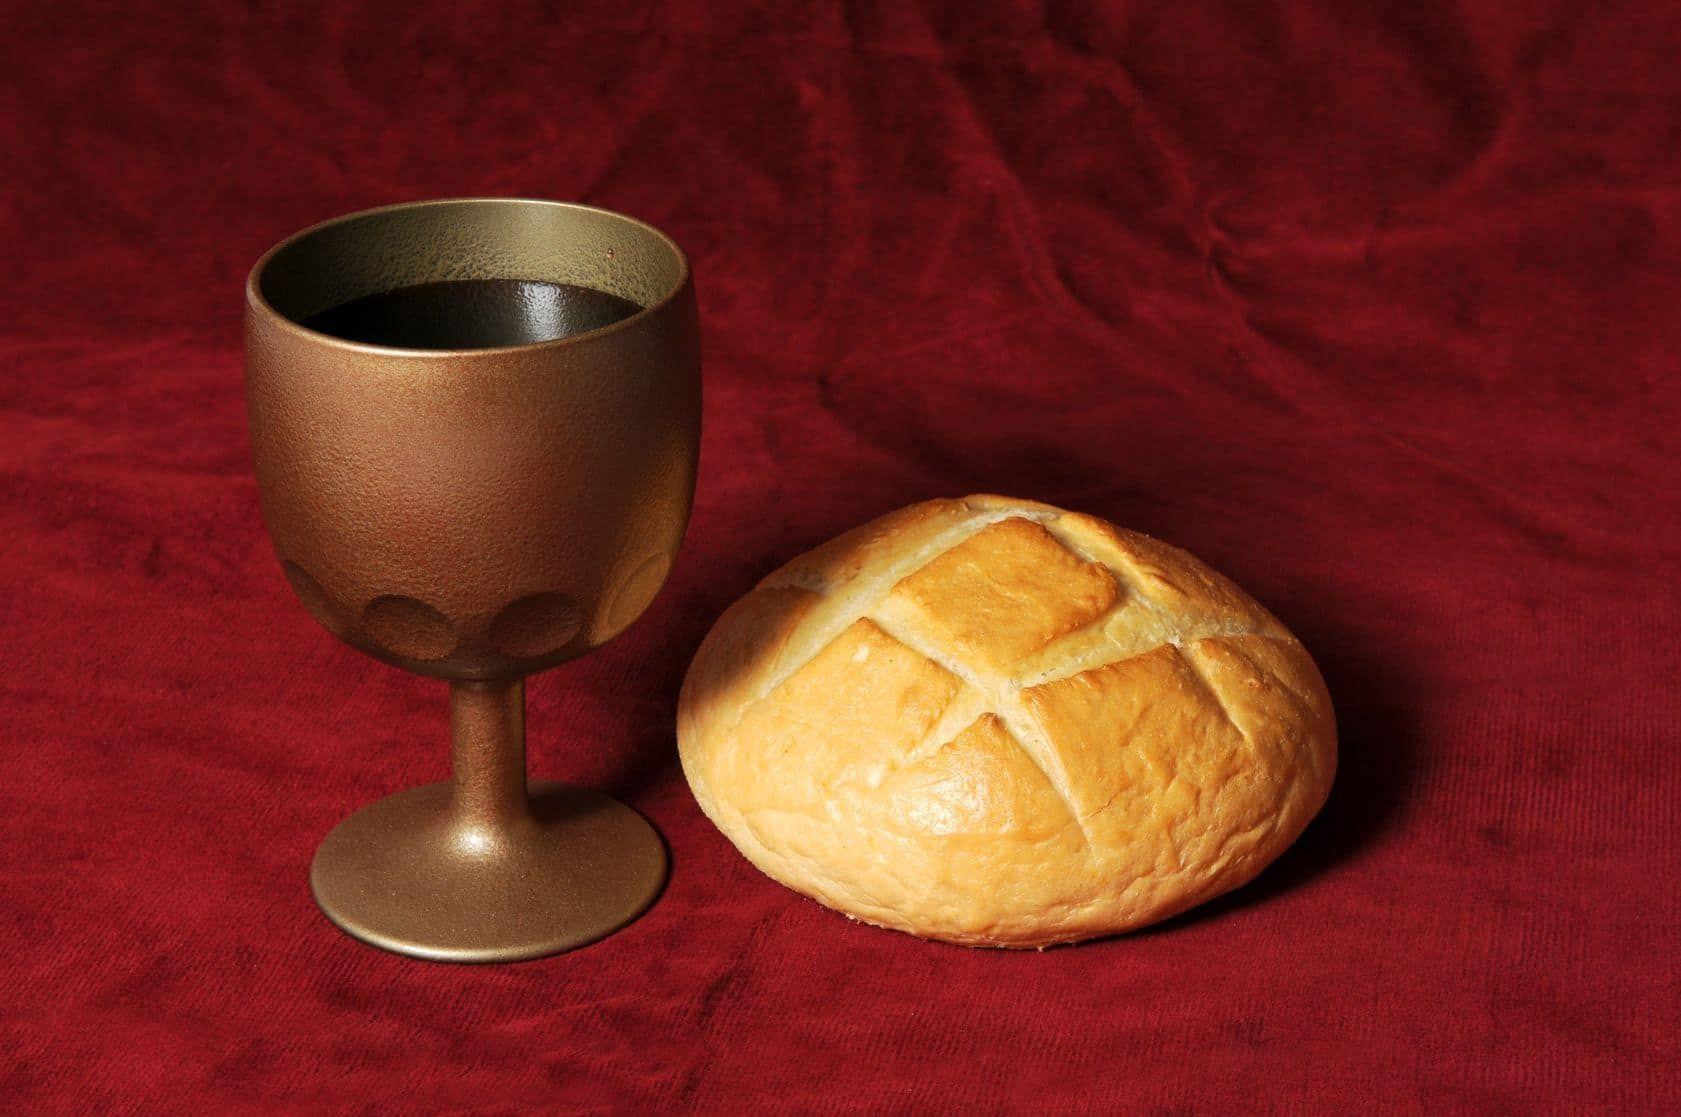 115 Reference Of Communion Bread Recipe Episcopal In 2020 Communion Bread Recipe Bread Recipes Gluten Free Crock Pot Recipes